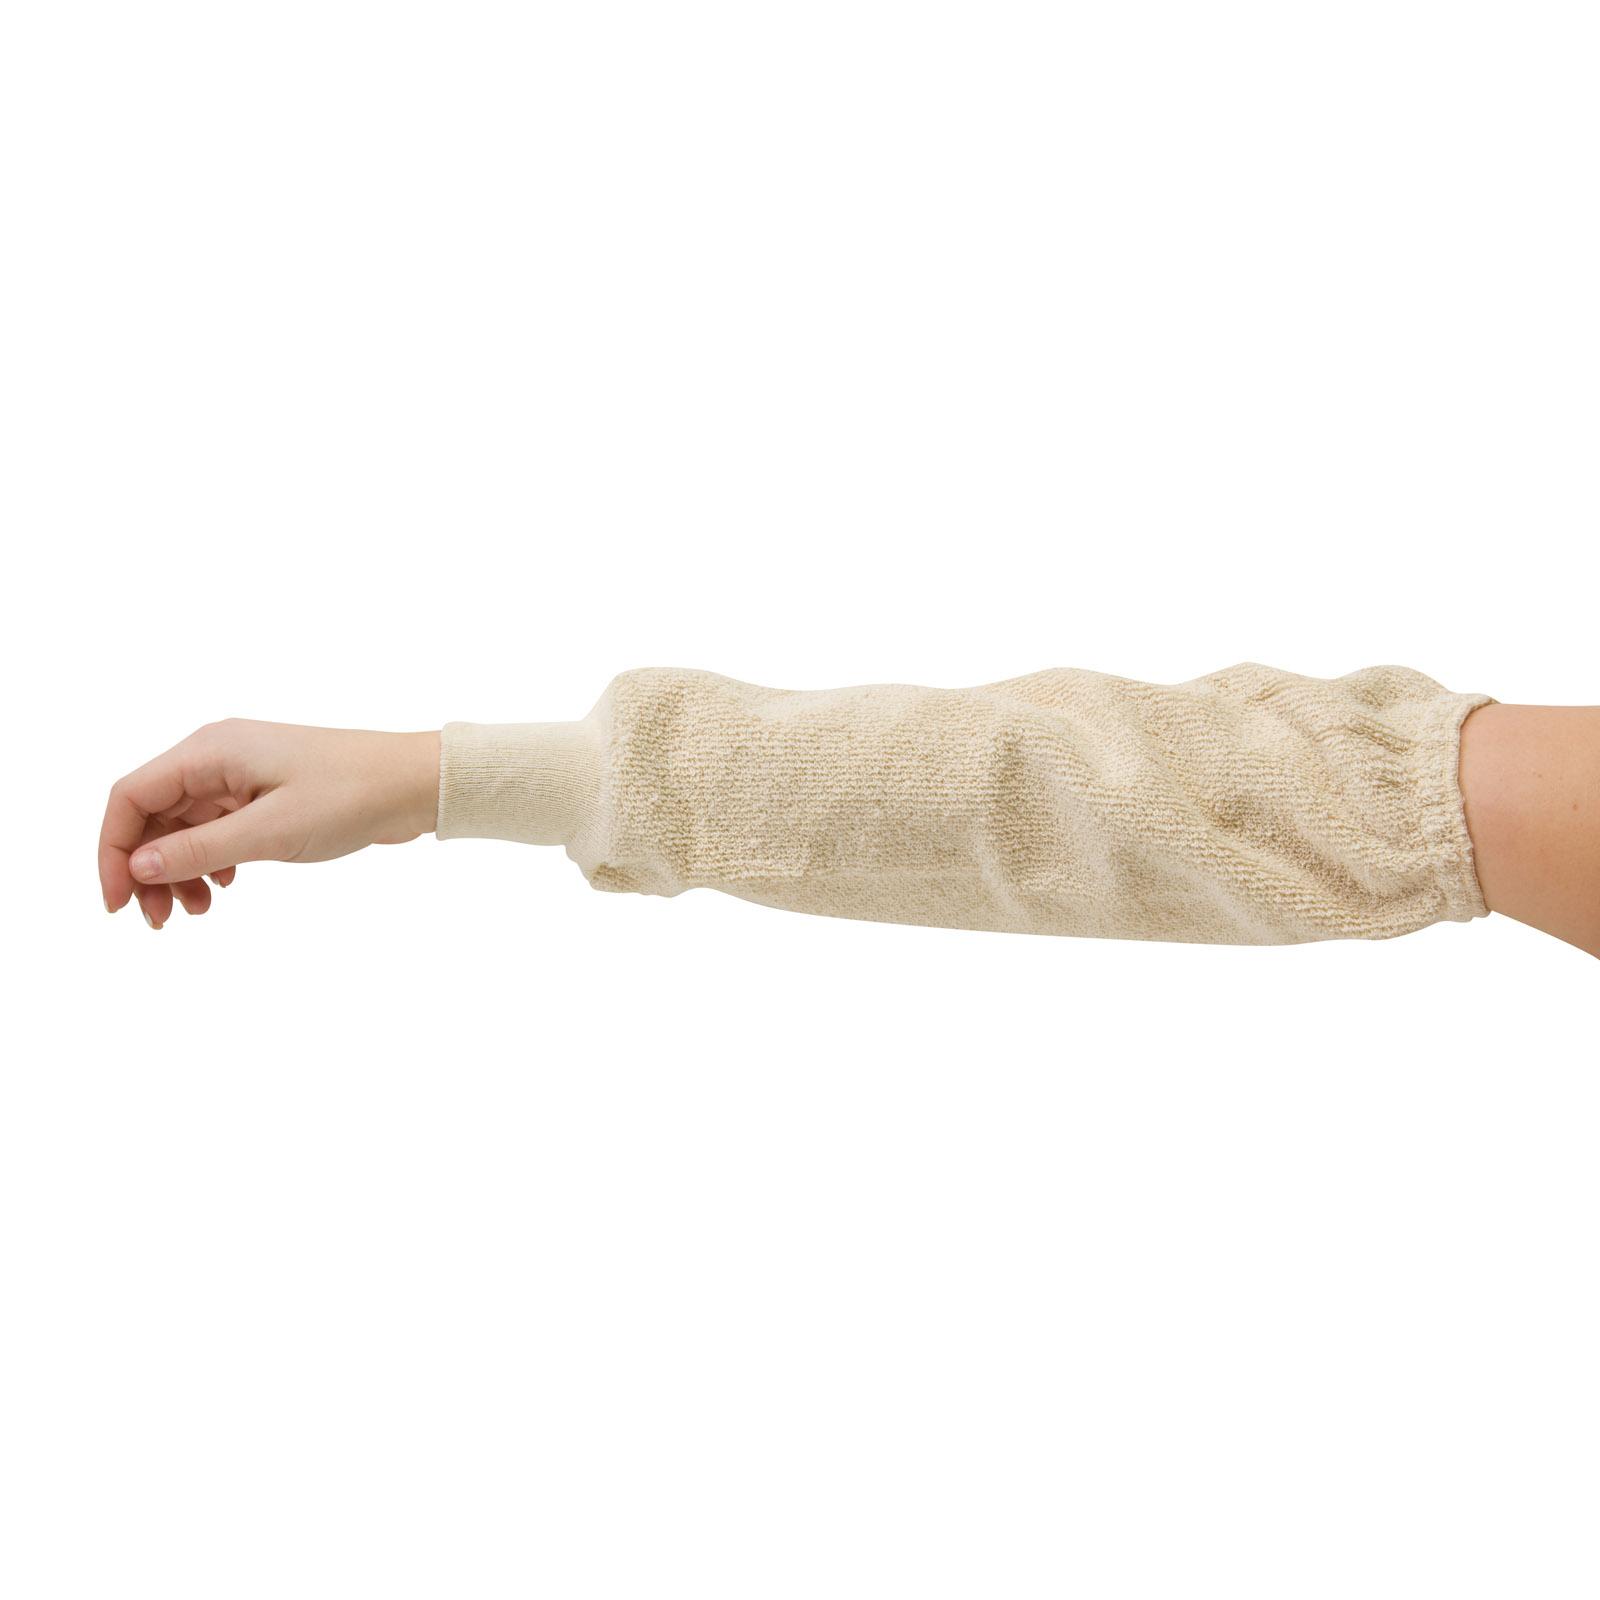 San Jamar SLWT16 sleeve, protective